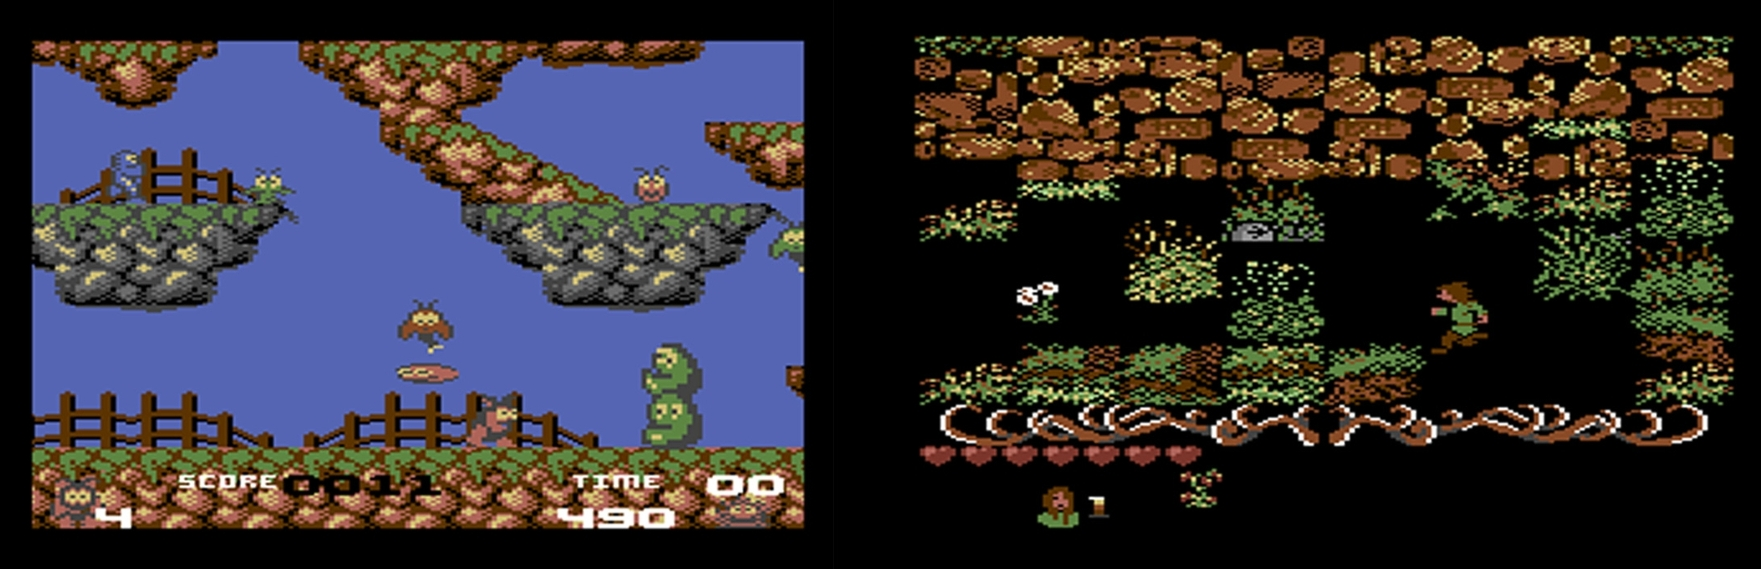 Consola The C64 Mini varios juegos